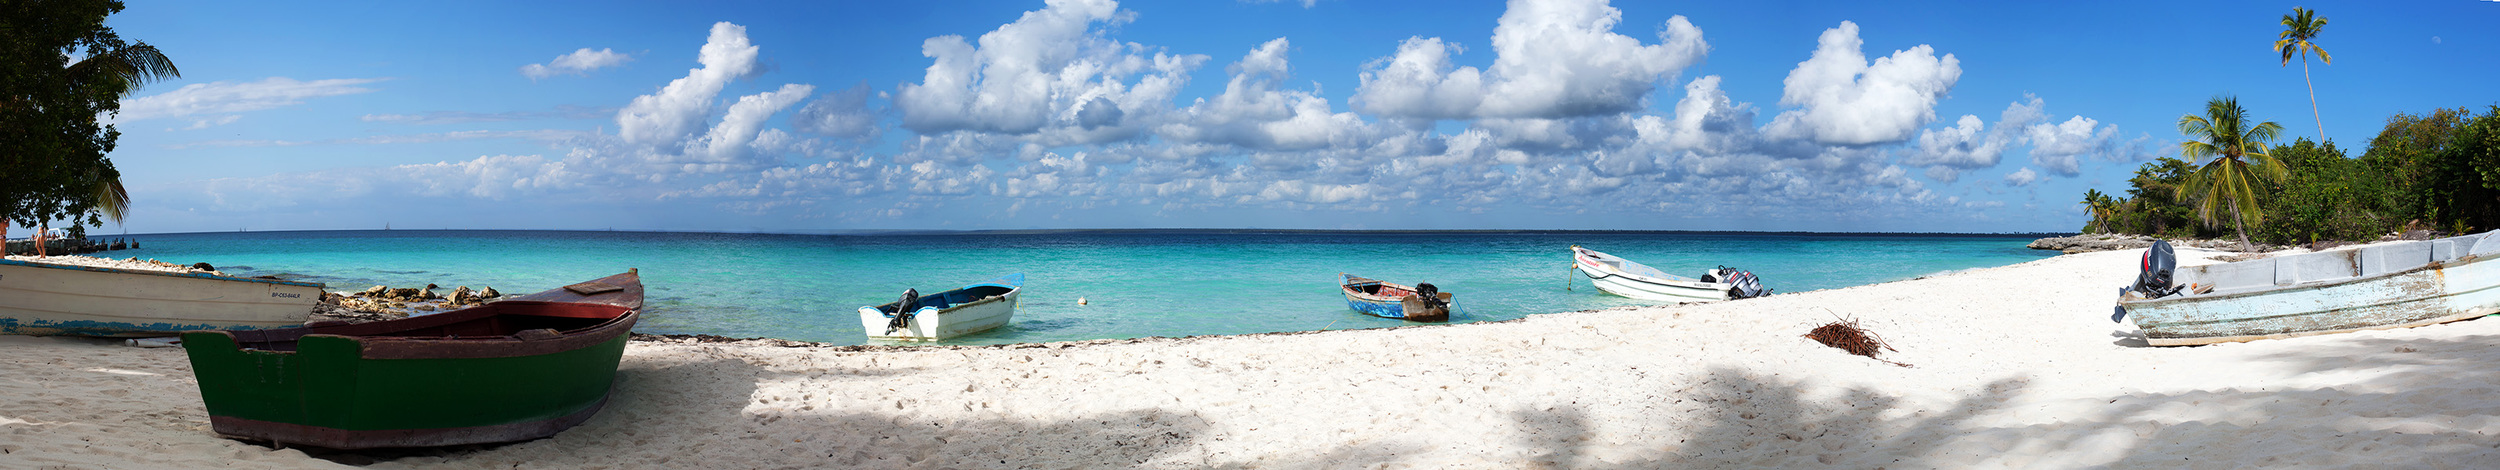 Beach Panorama | Saona Island, Dominican Republic